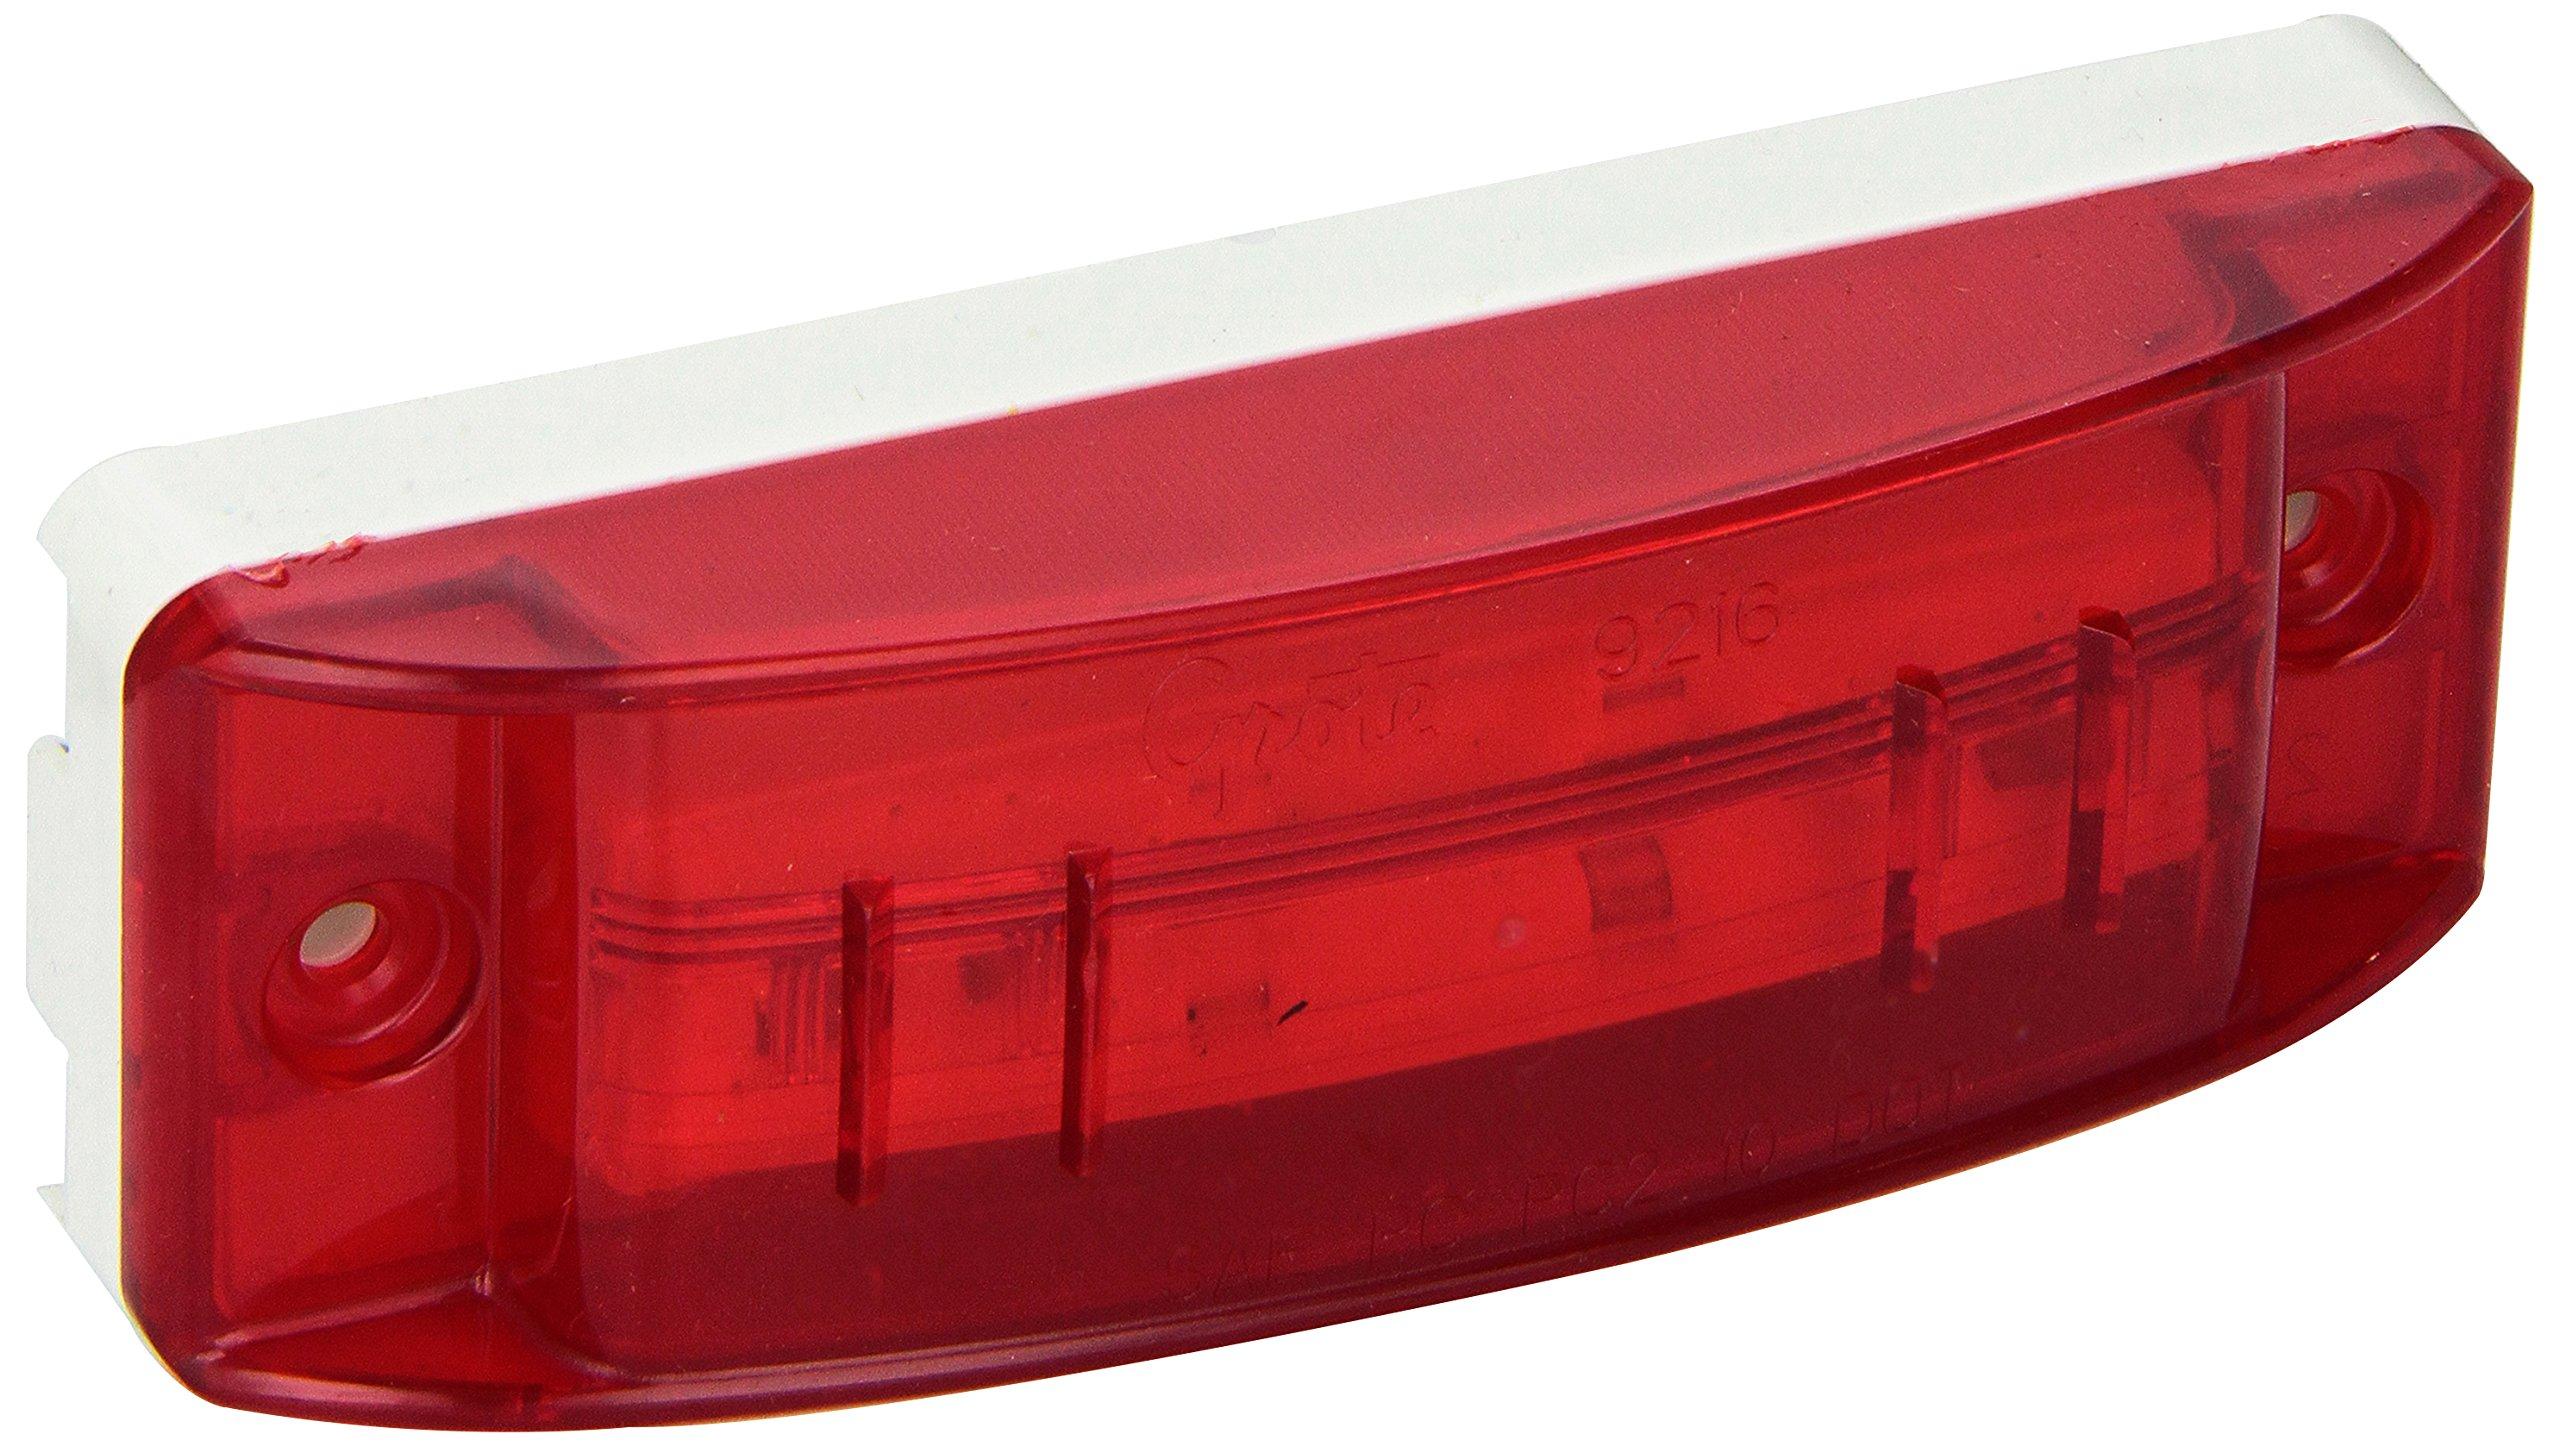 Grote 47162 SuperNova Sealed Turtleback II LED Clearance Marker Light (Optic Lens, Male Pin)